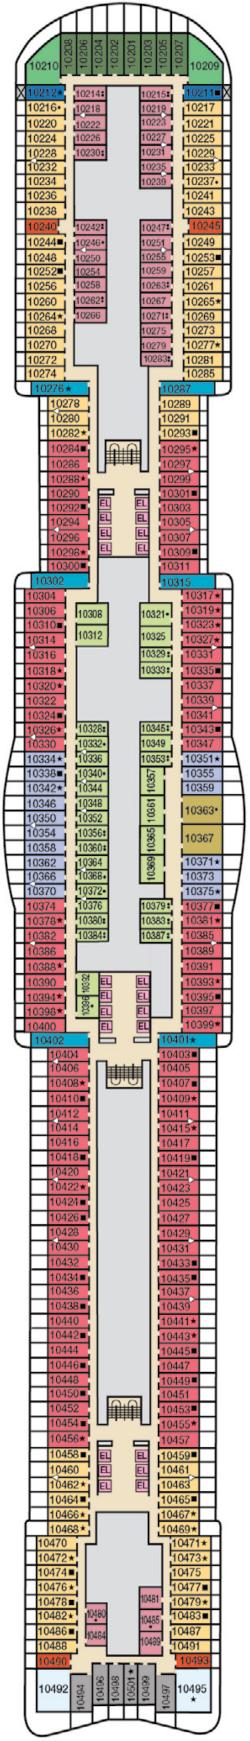 Mardi Gras Deck 10 Deck Plan